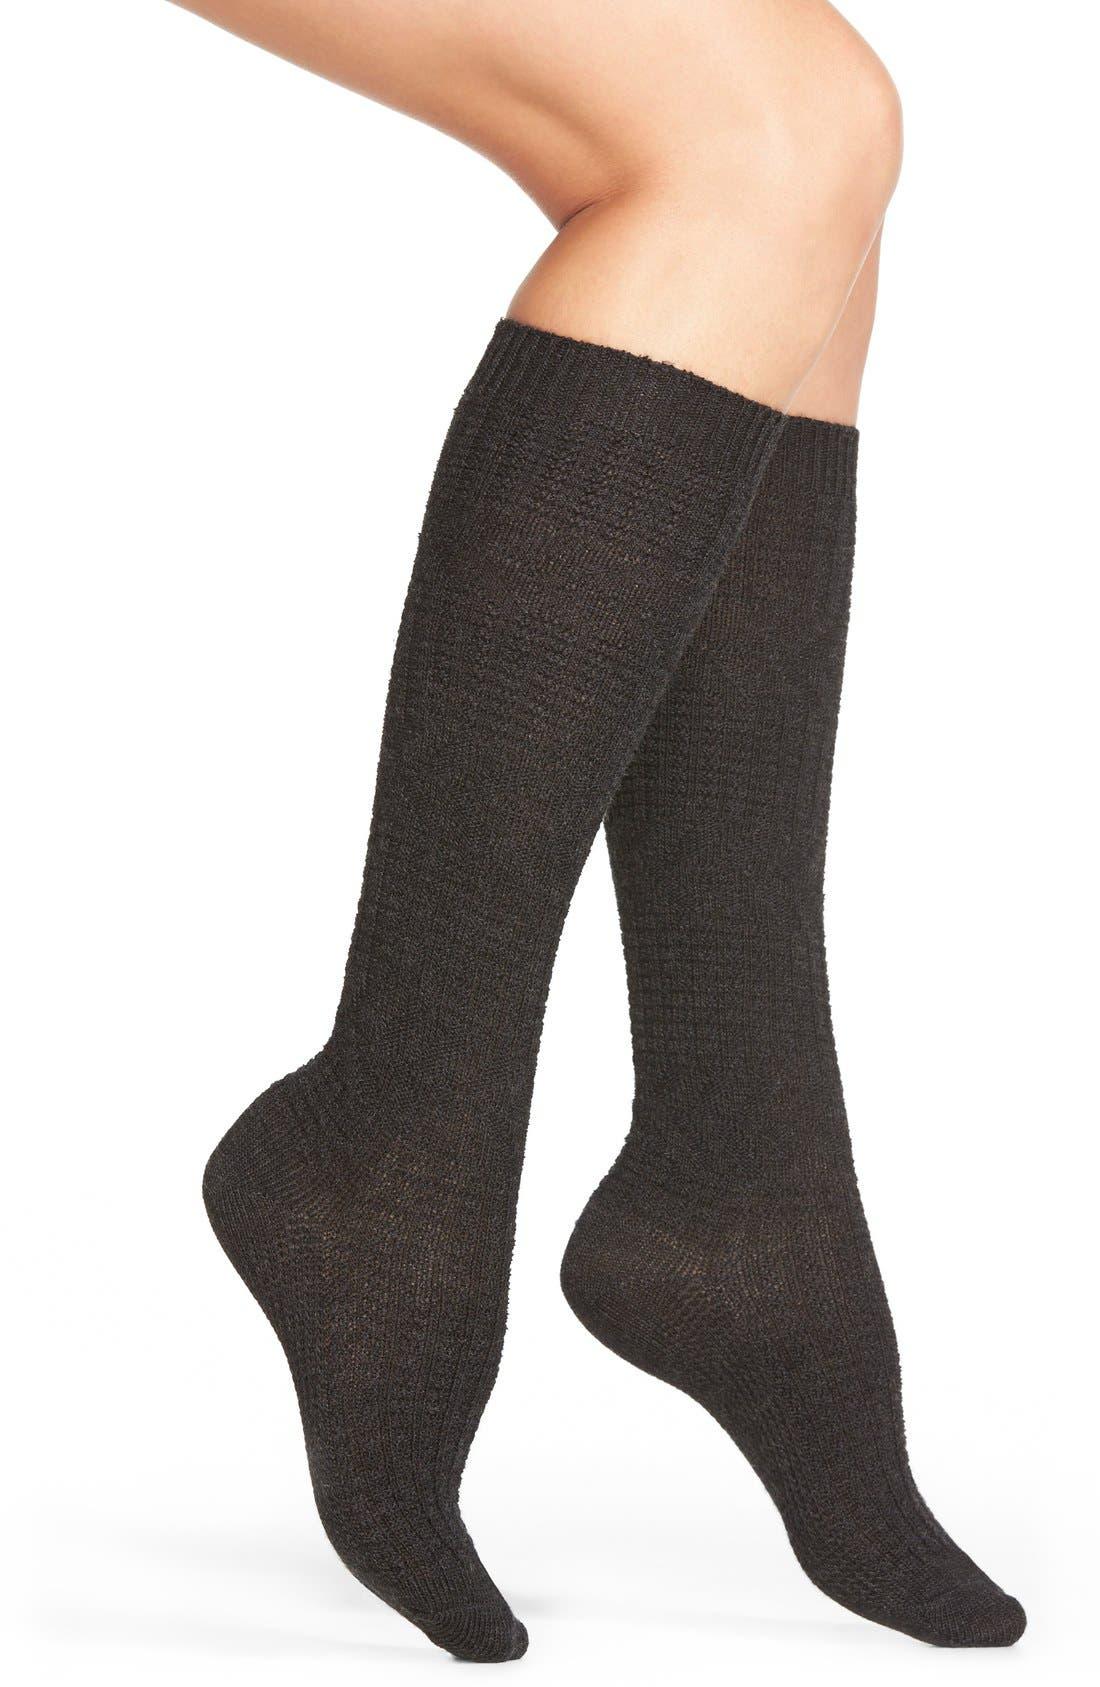 'Wheat Fields' Merino Wool Blend Socks,                             Main thumbnail 1, color,                             030